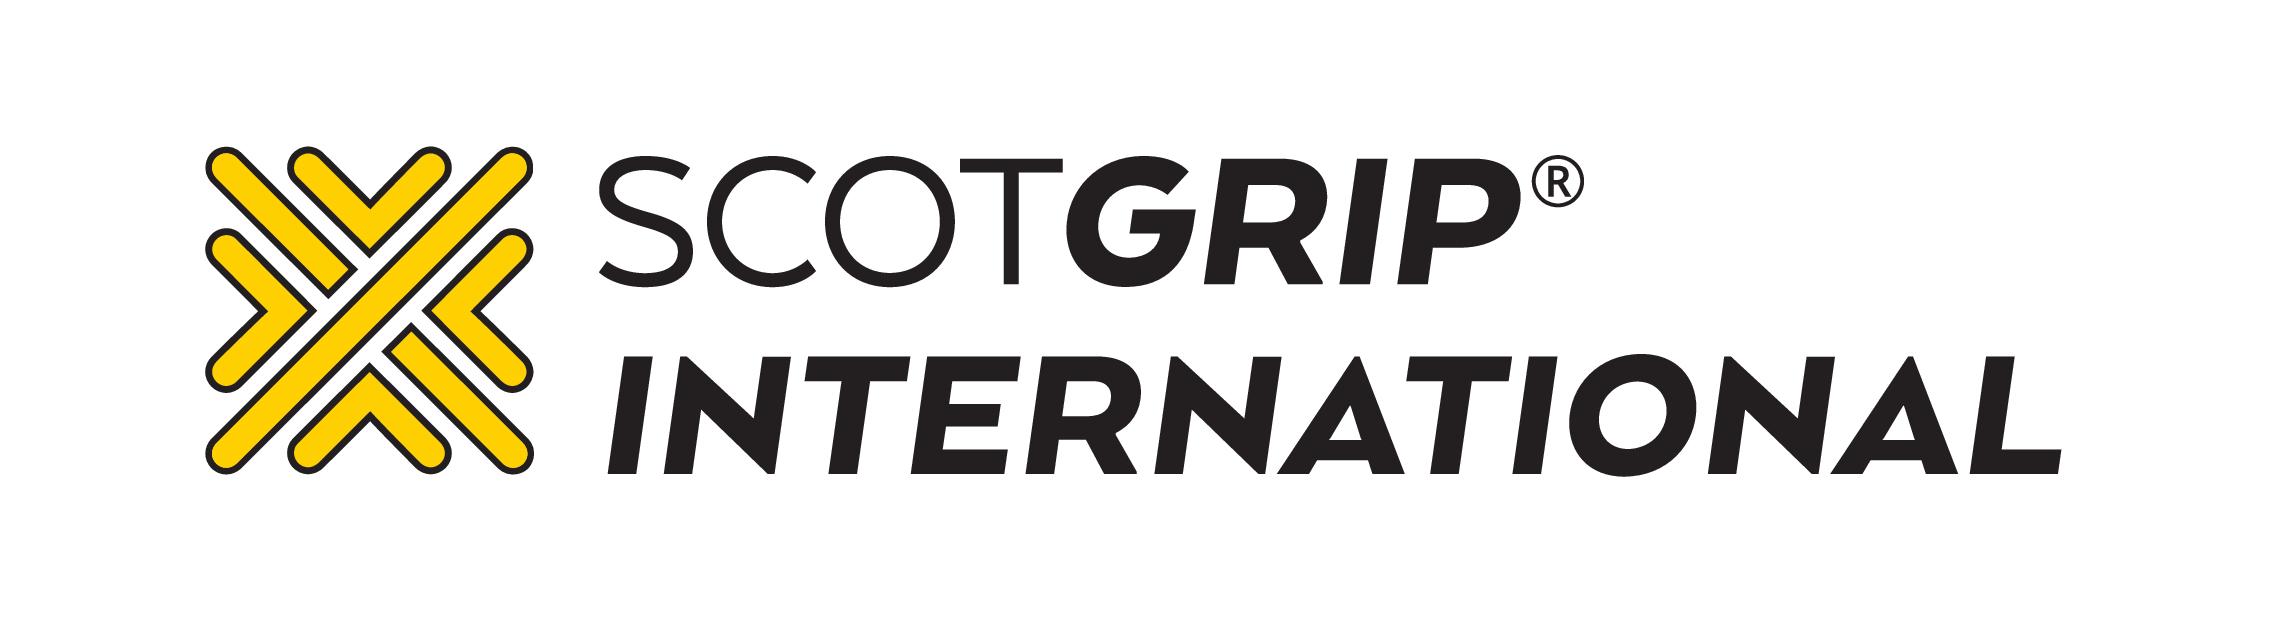 Scotgrip International logo